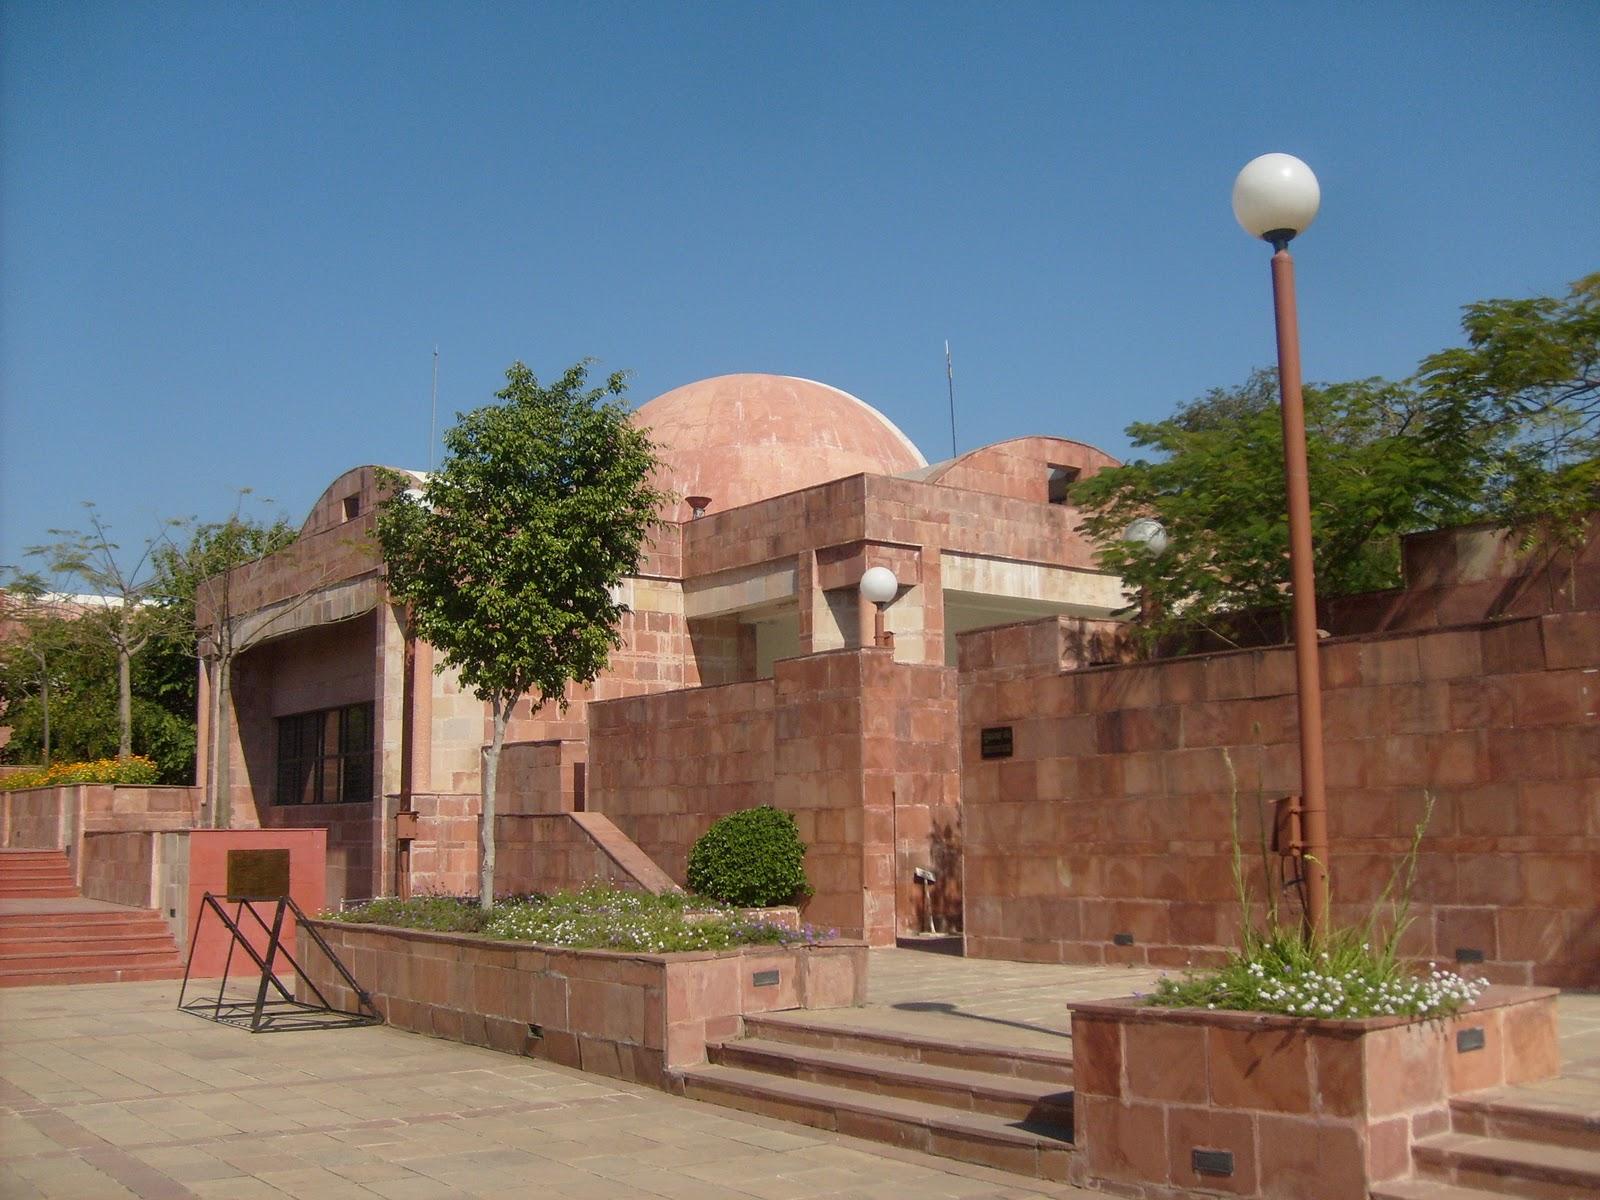 Top Place To Visit In Bhopal-Indira Gandhi Rashtriya Manav Sangrahalaya